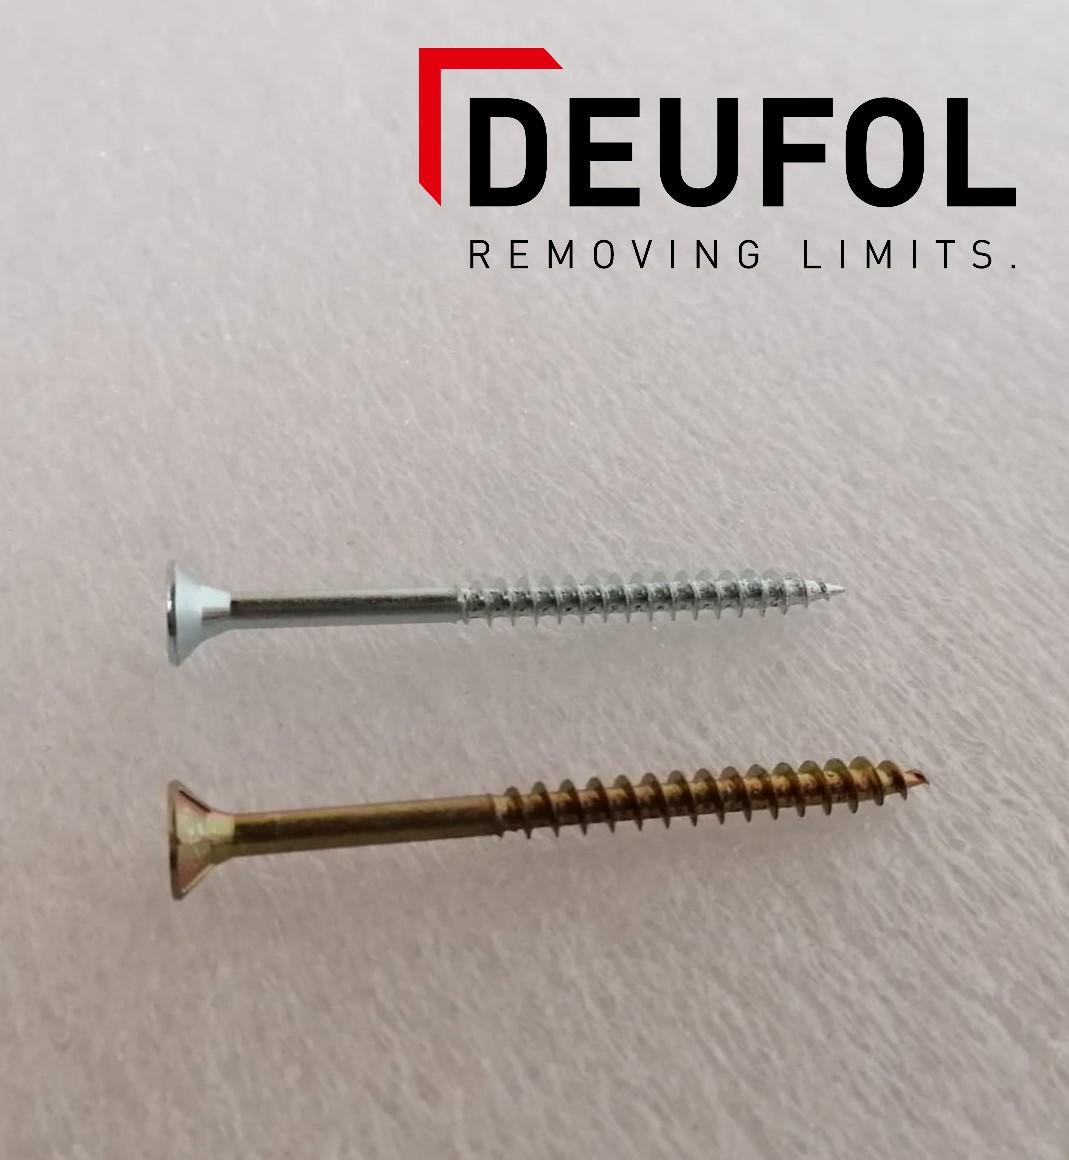 Wood screw 4,5x80mm TX25 zinc plated - 200 pieces